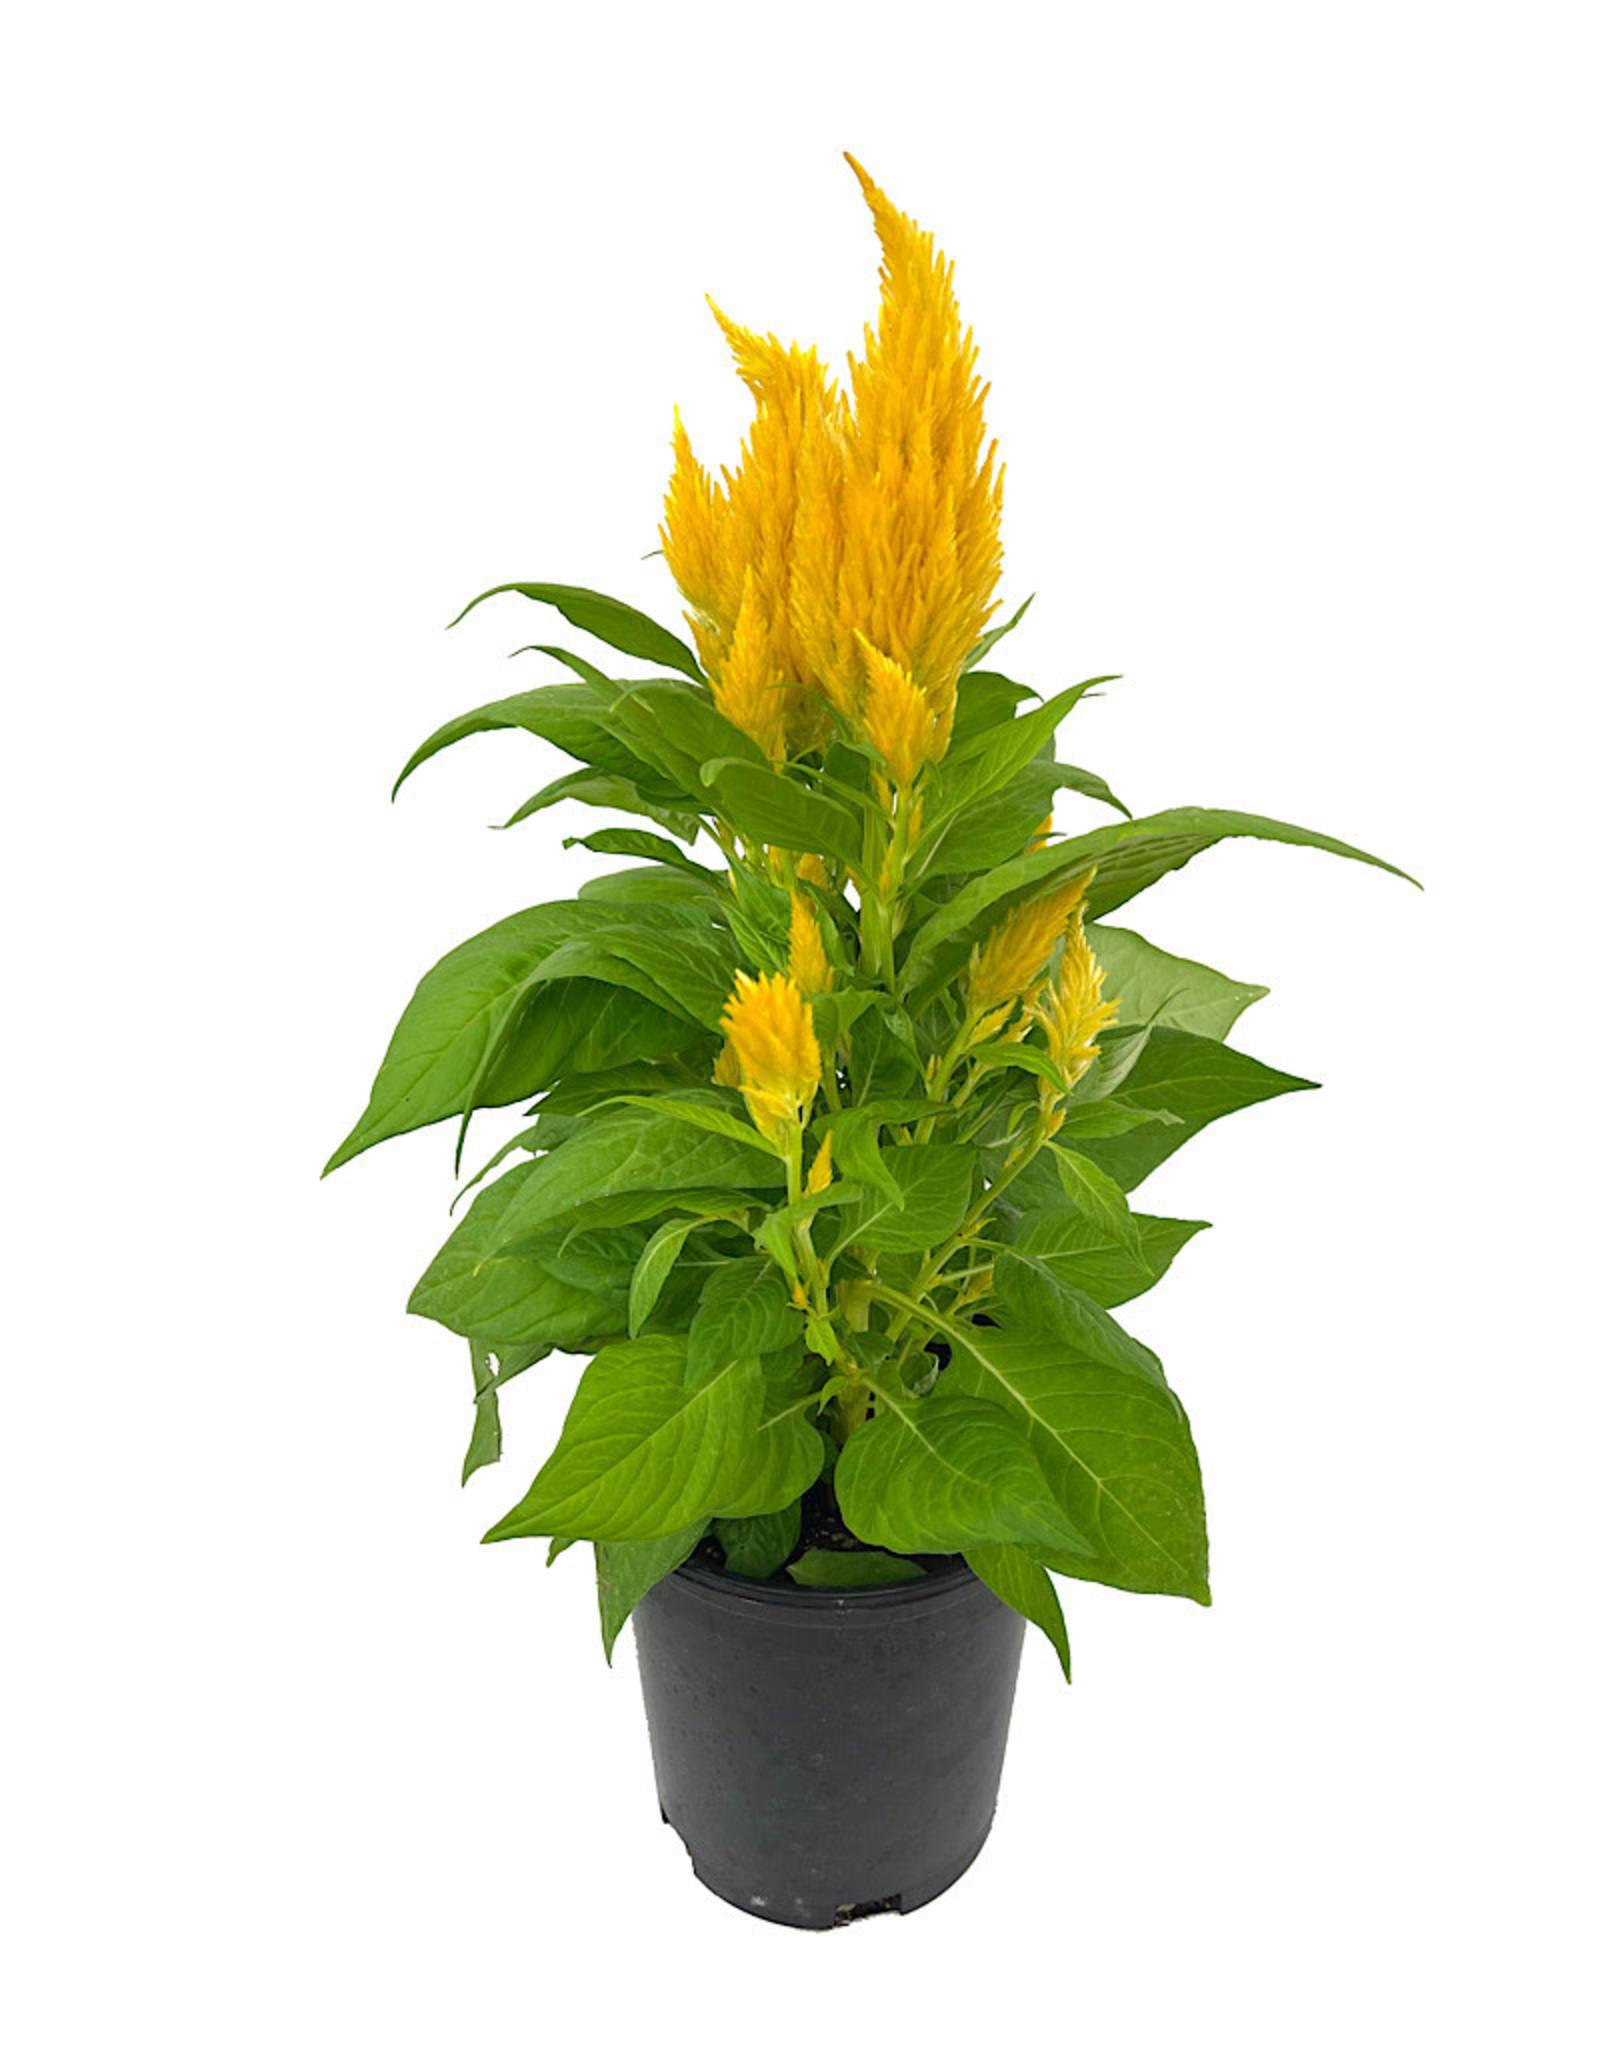 Celosia 'First Flame Yellow' 1 Gallon